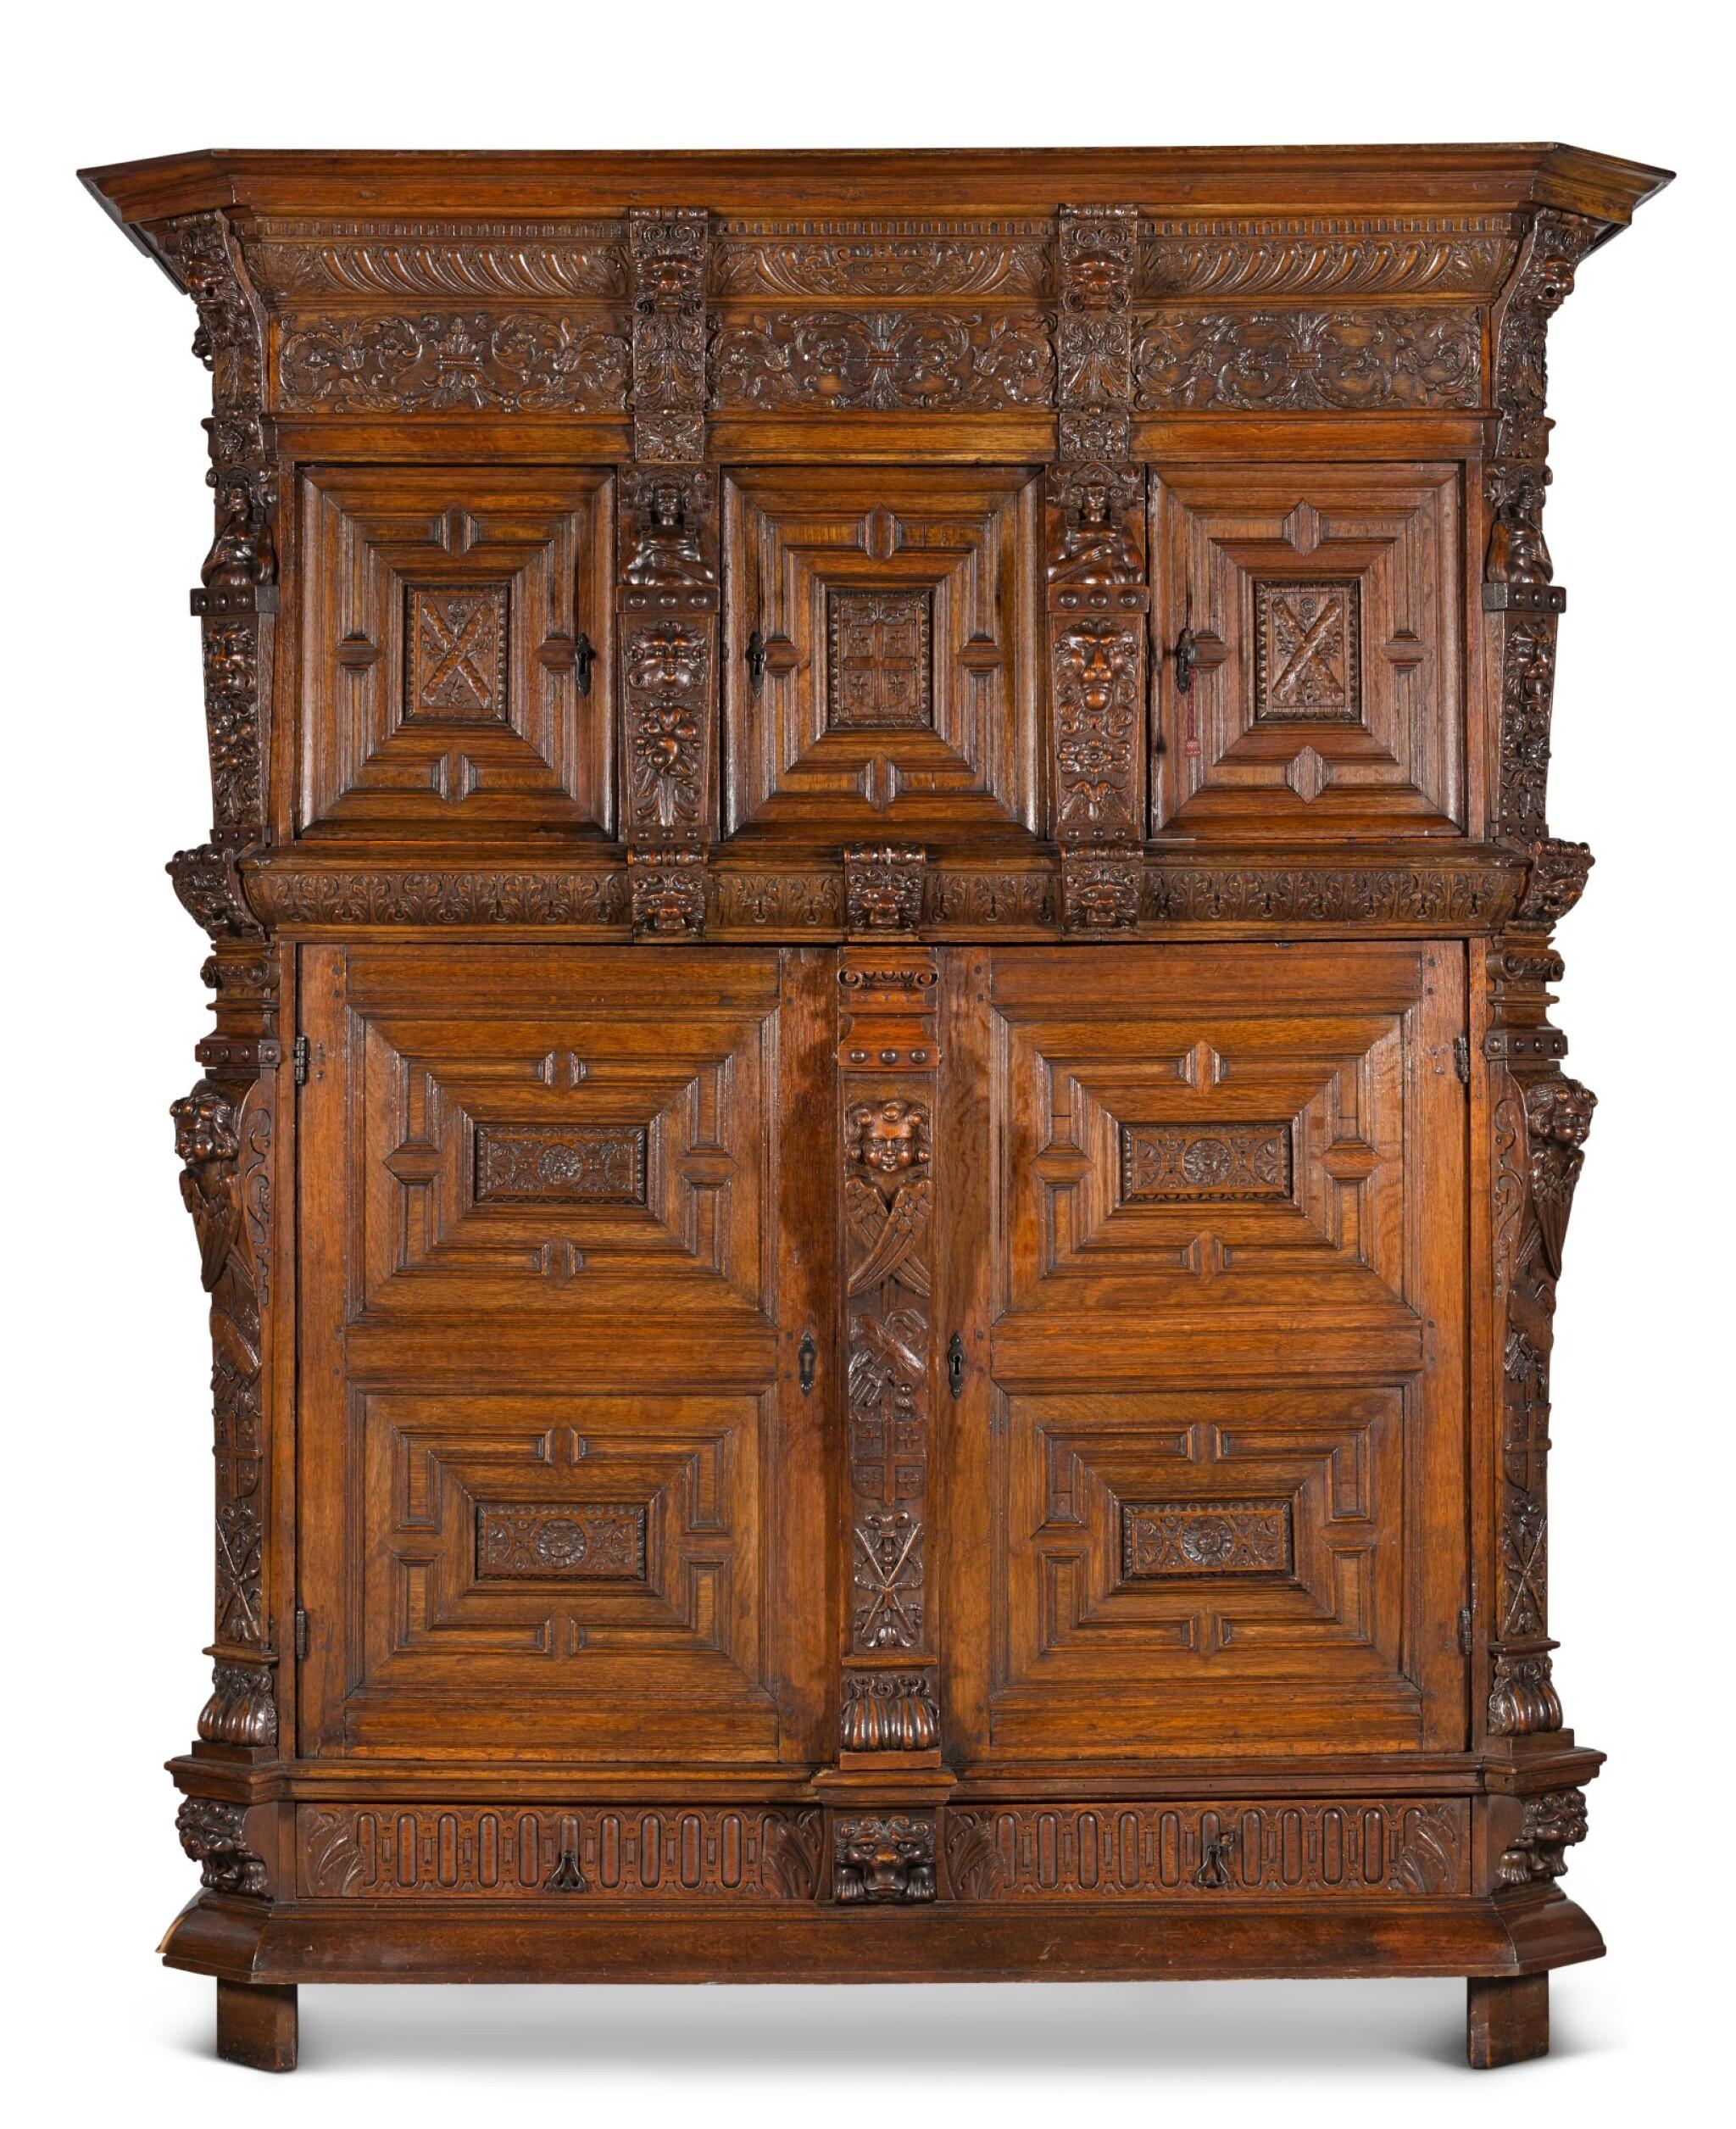 View full screen - View 1 of Lot 5. A Flemish Renaissance style carved oak cabinet (buffet à cinq portes), probably Antwerp.